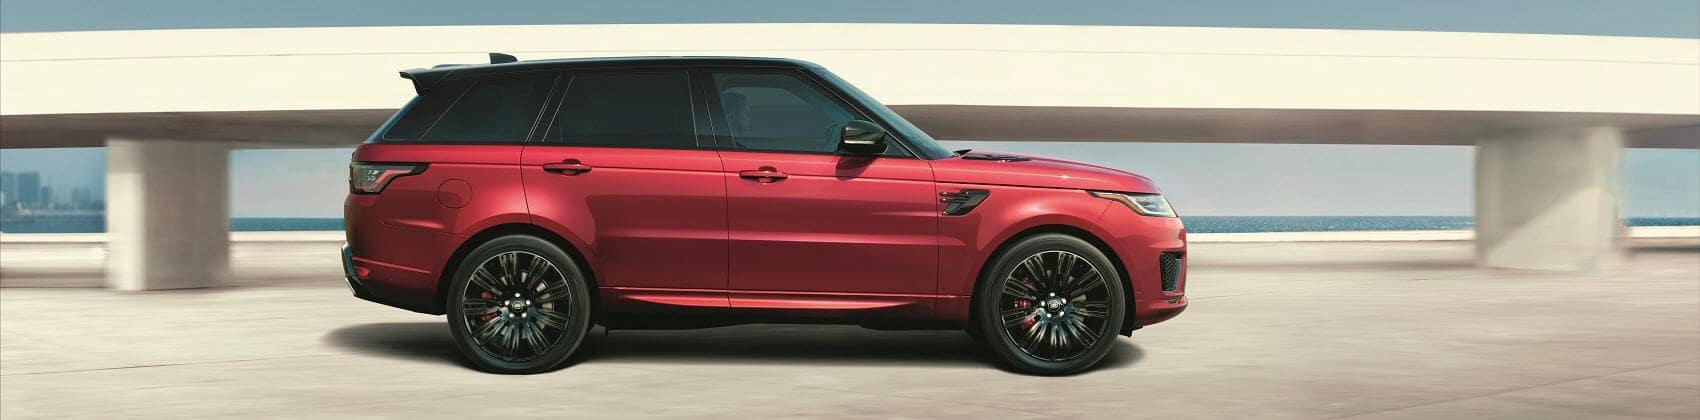 2019 Range Rover Sport vs BMW X5